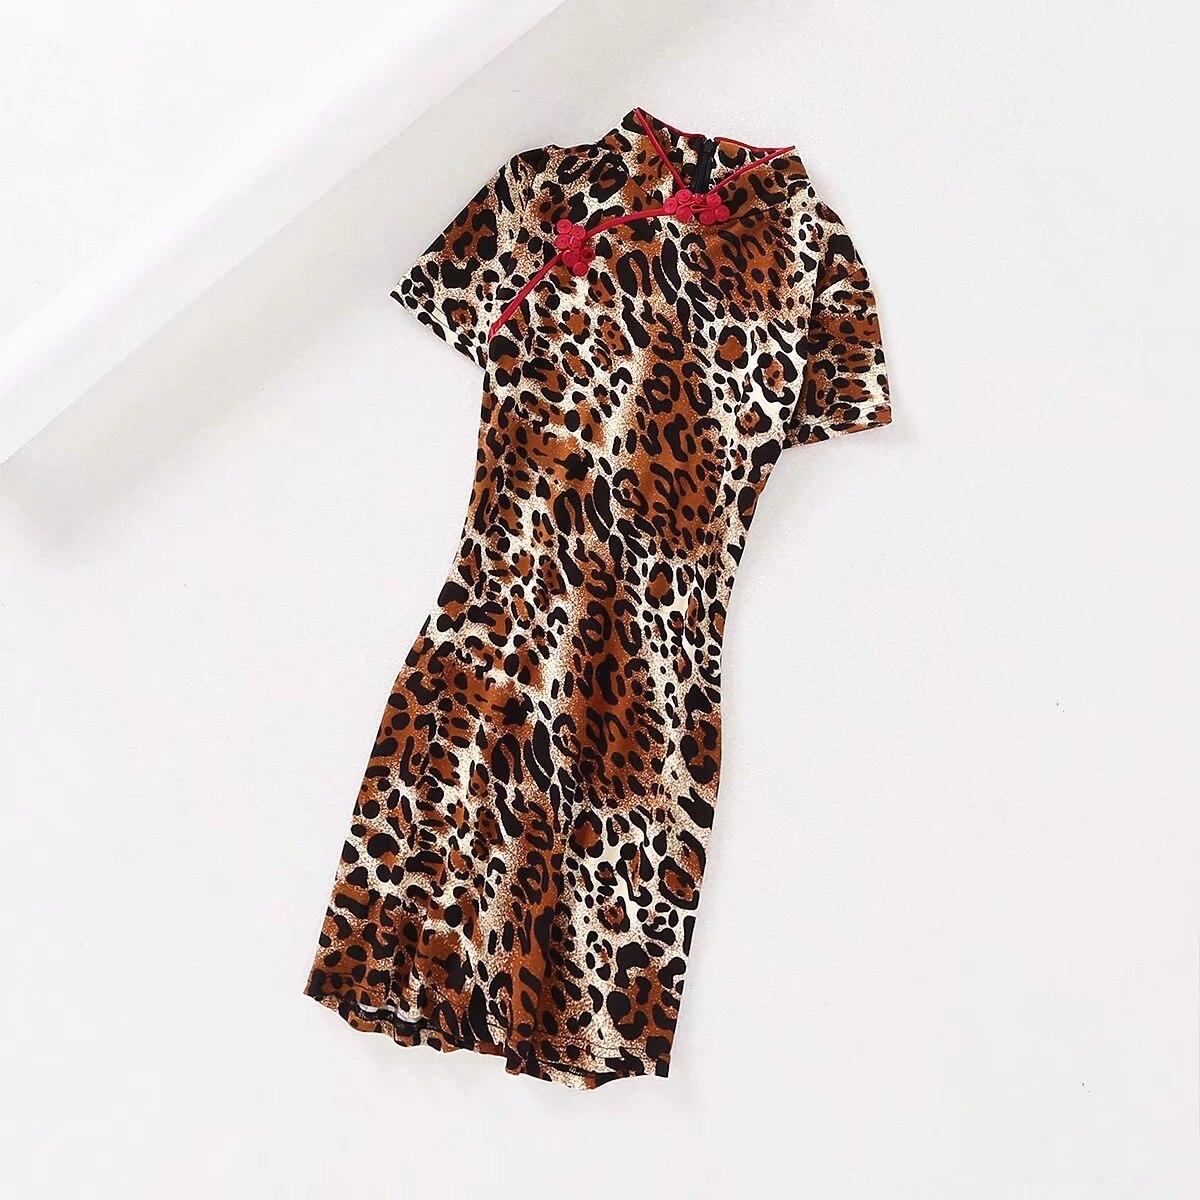 2019 New Products INS Europe And America WOMEN'S Dress Leopord Pattern Knot Button Bag Body Cheongsam-Dress Slim Fit Mini Dress